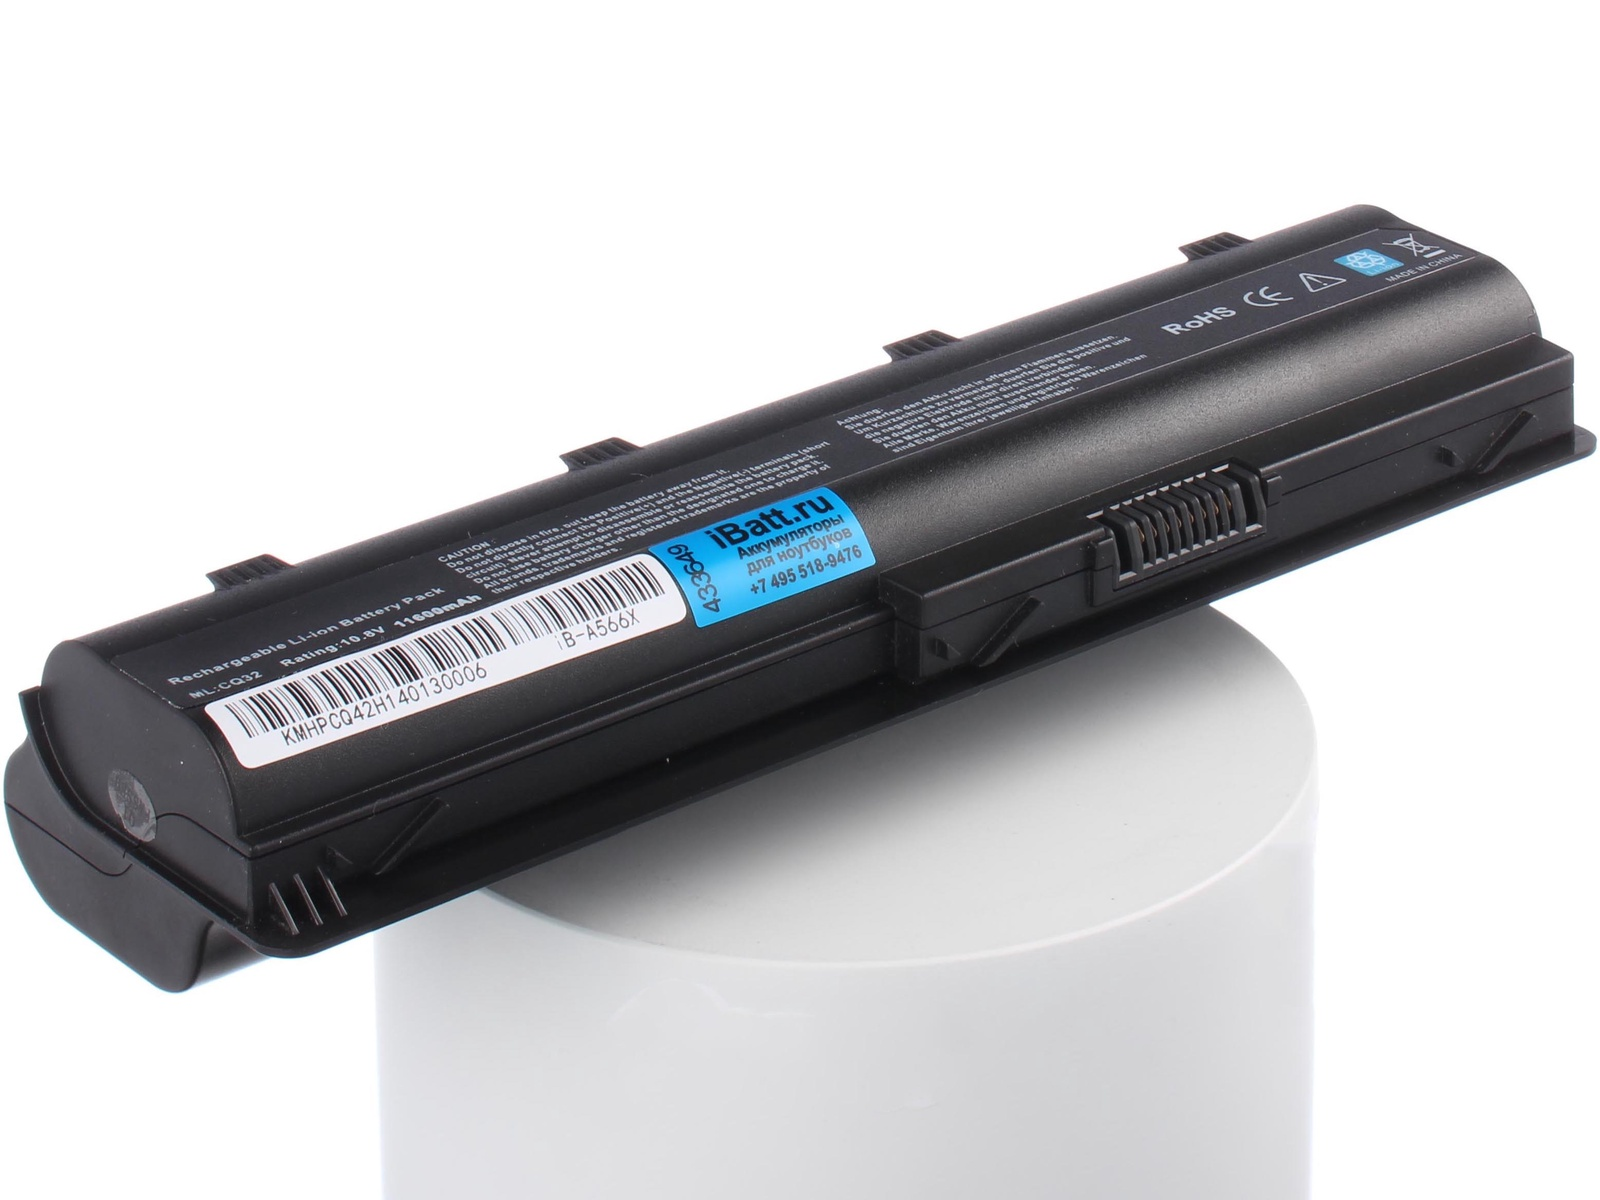 Аккумулятор для ноутбука iBatt для HP-Compaq Pavilion g6-2127sr, 635 Notebook PC, CQ58-253SR, Pavilion g6-1000er, Presario CQ56-103ER, Pavilion dv6-3109er, Pavilion dv7-6b53er, Pavilion g6-1306er, Pavilion g6-2128sr iBatt